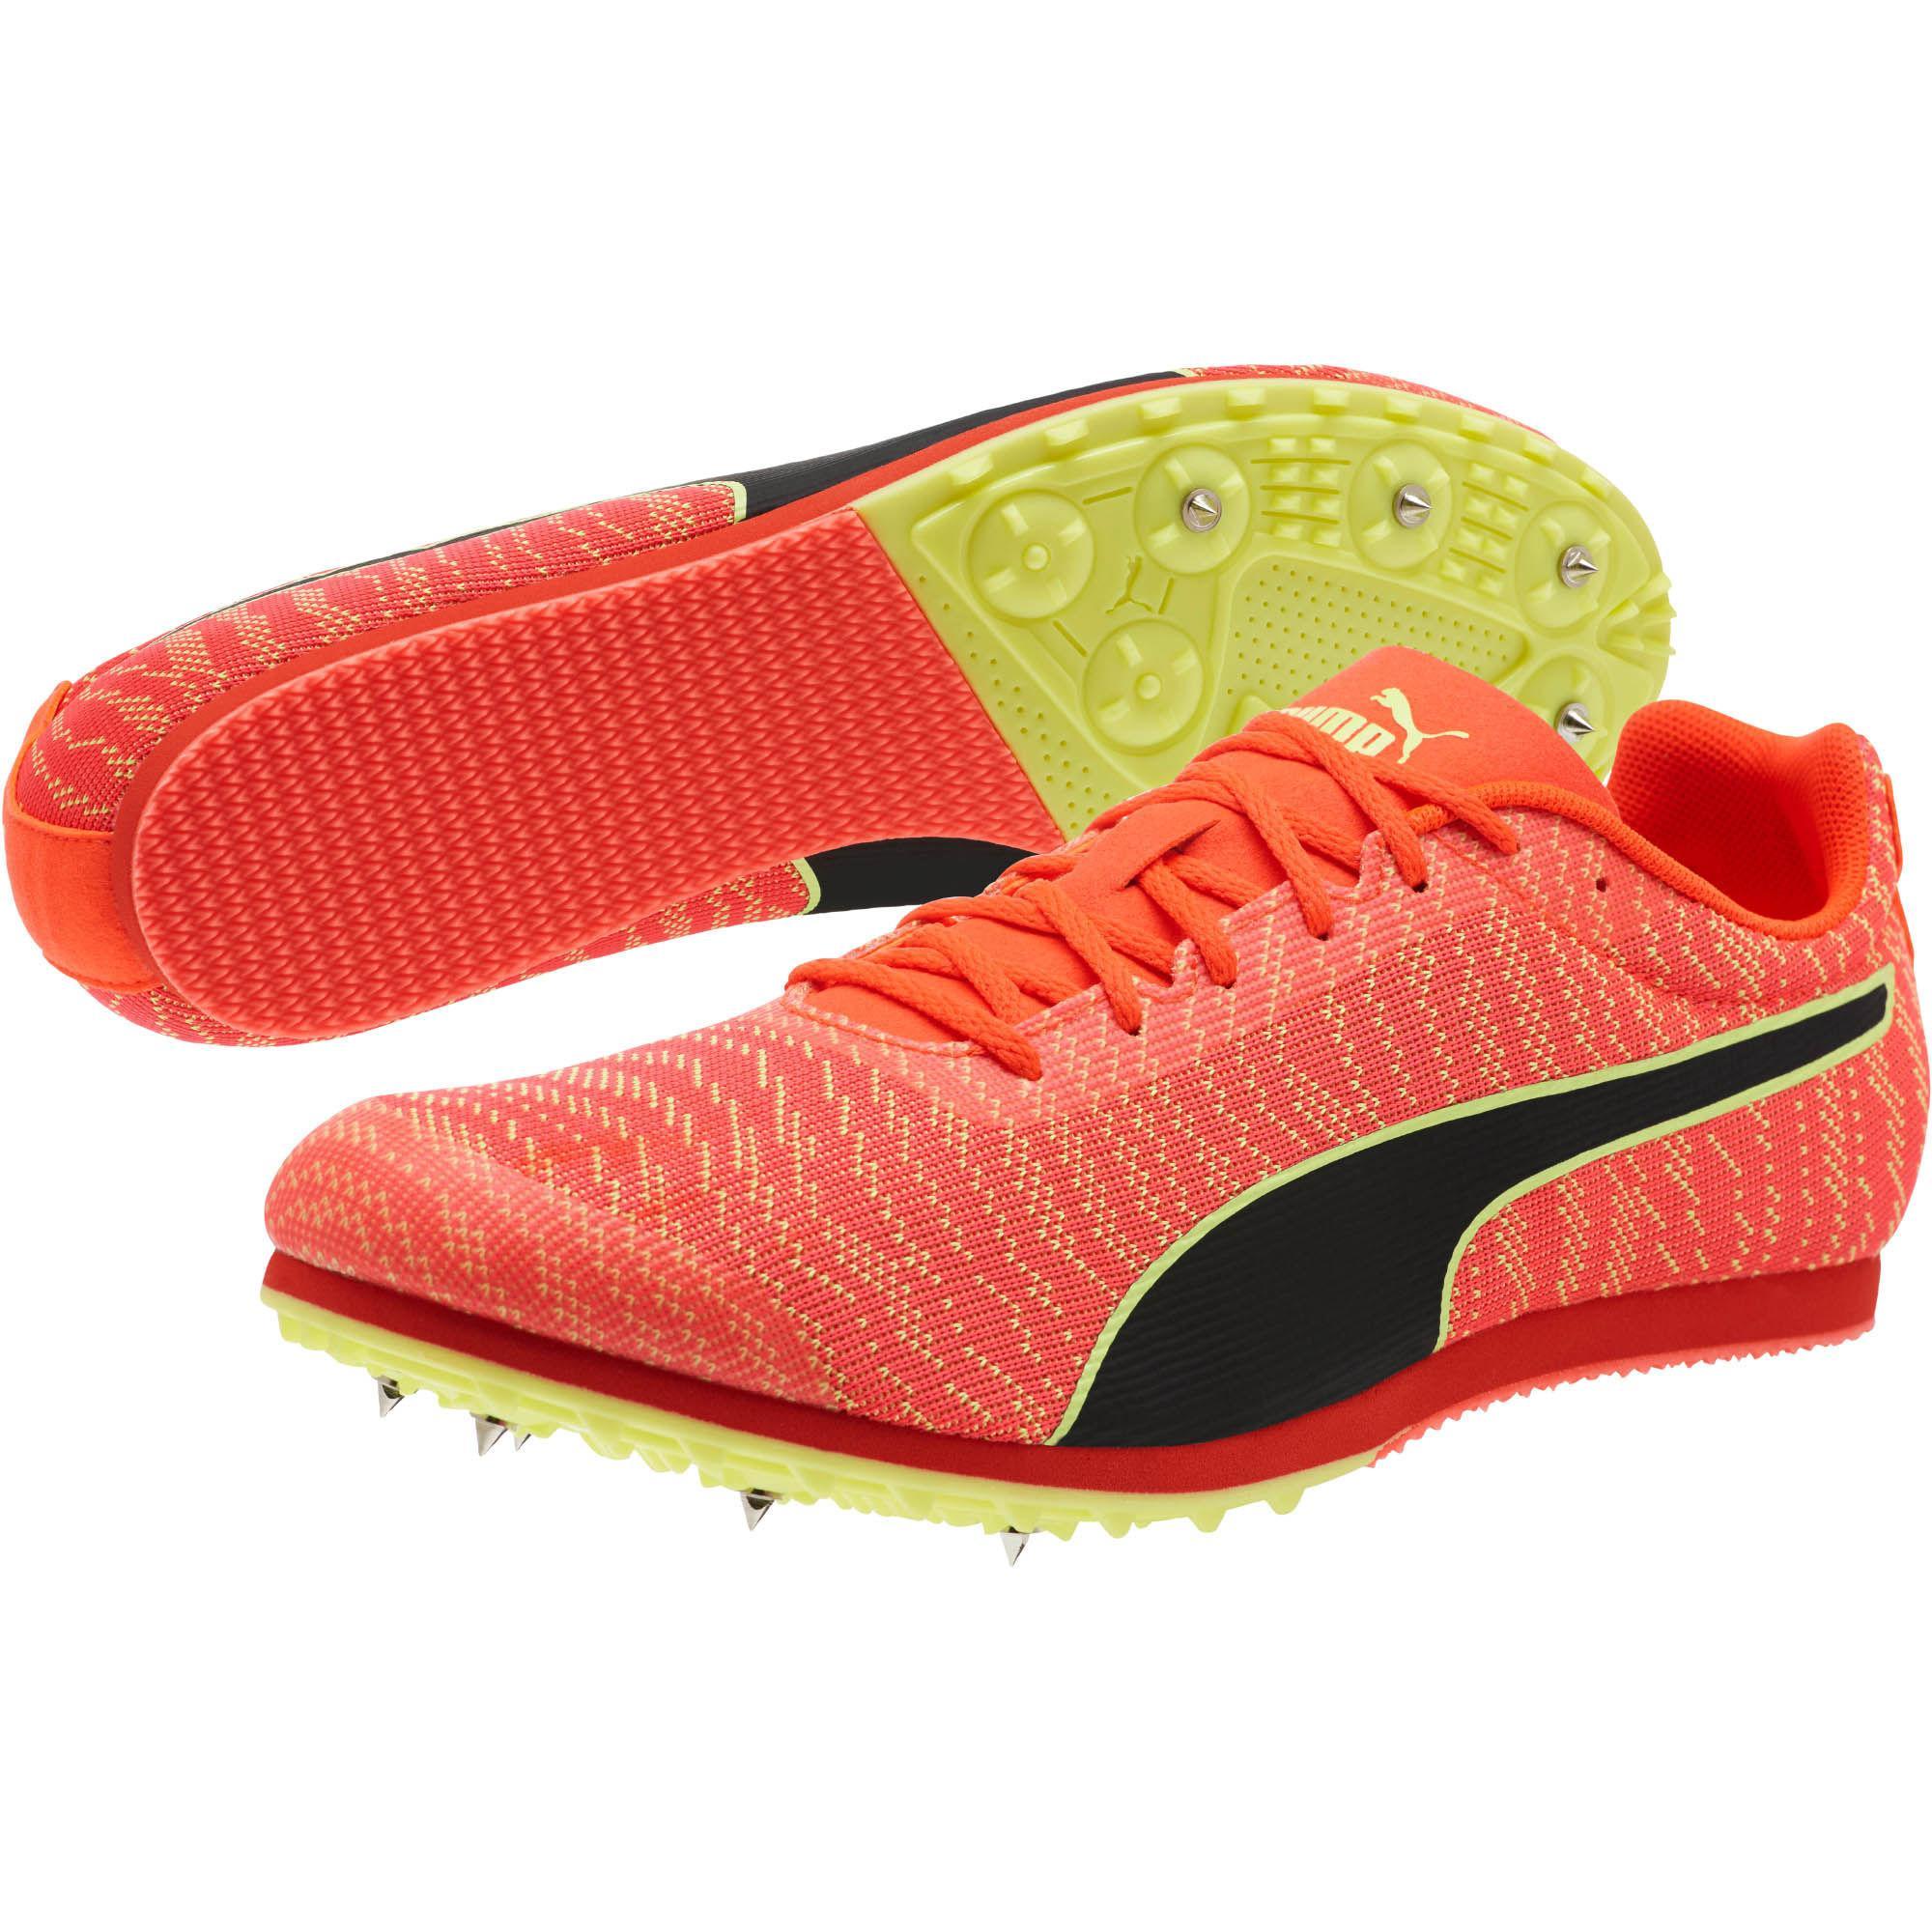 9d5e9f9c565f6b Lyst - PUMA Evospeed Star 6 Men s Track Spikes in Red for Men